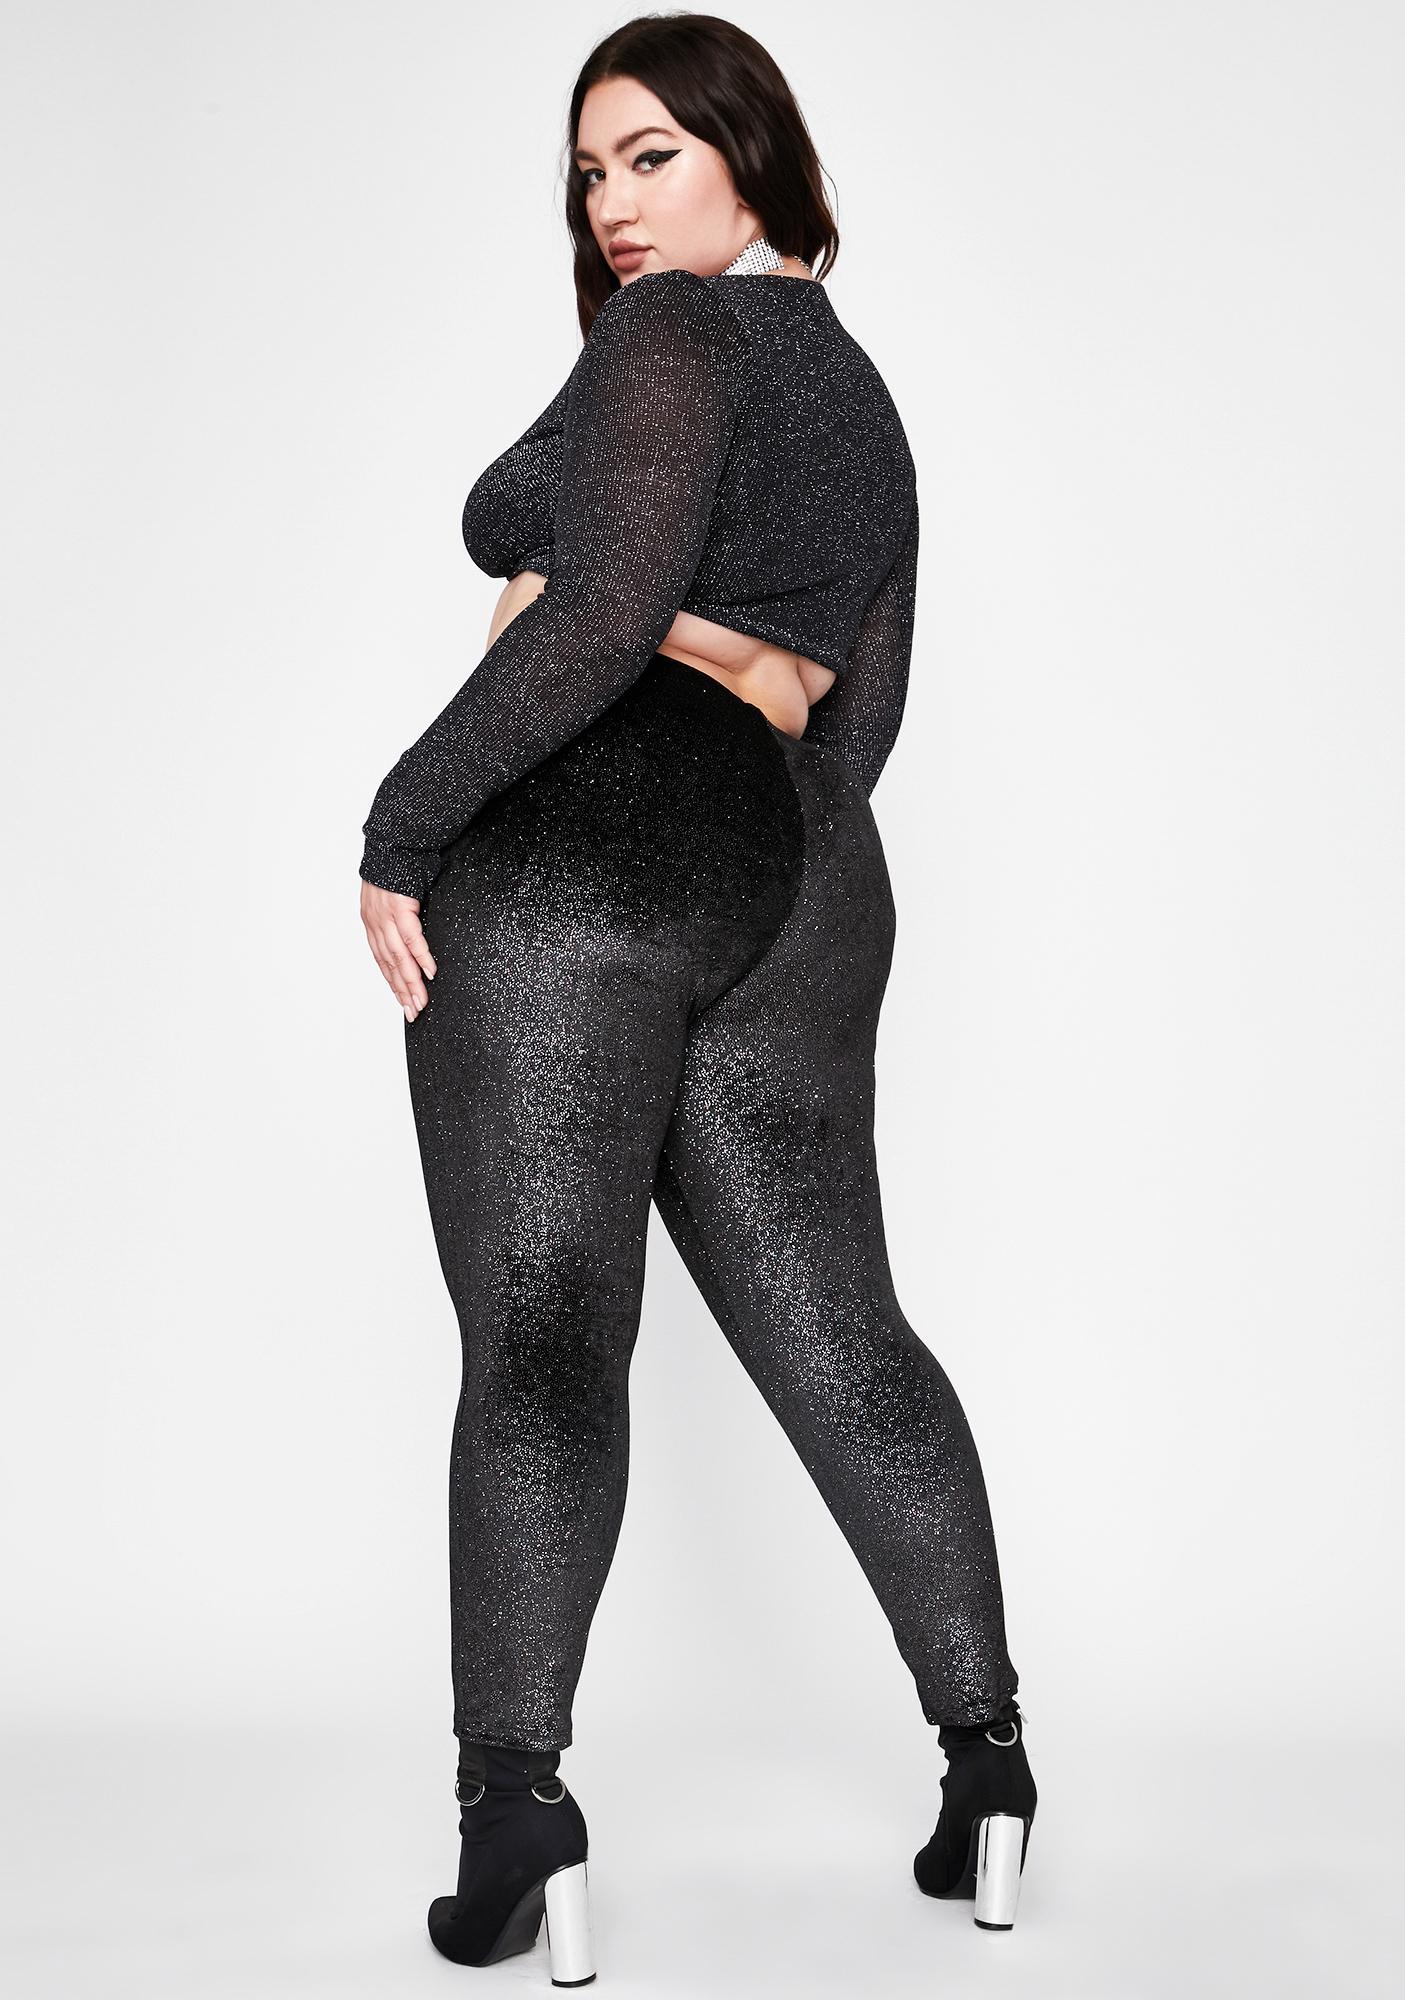 She's Forever Lux Glitter Pants